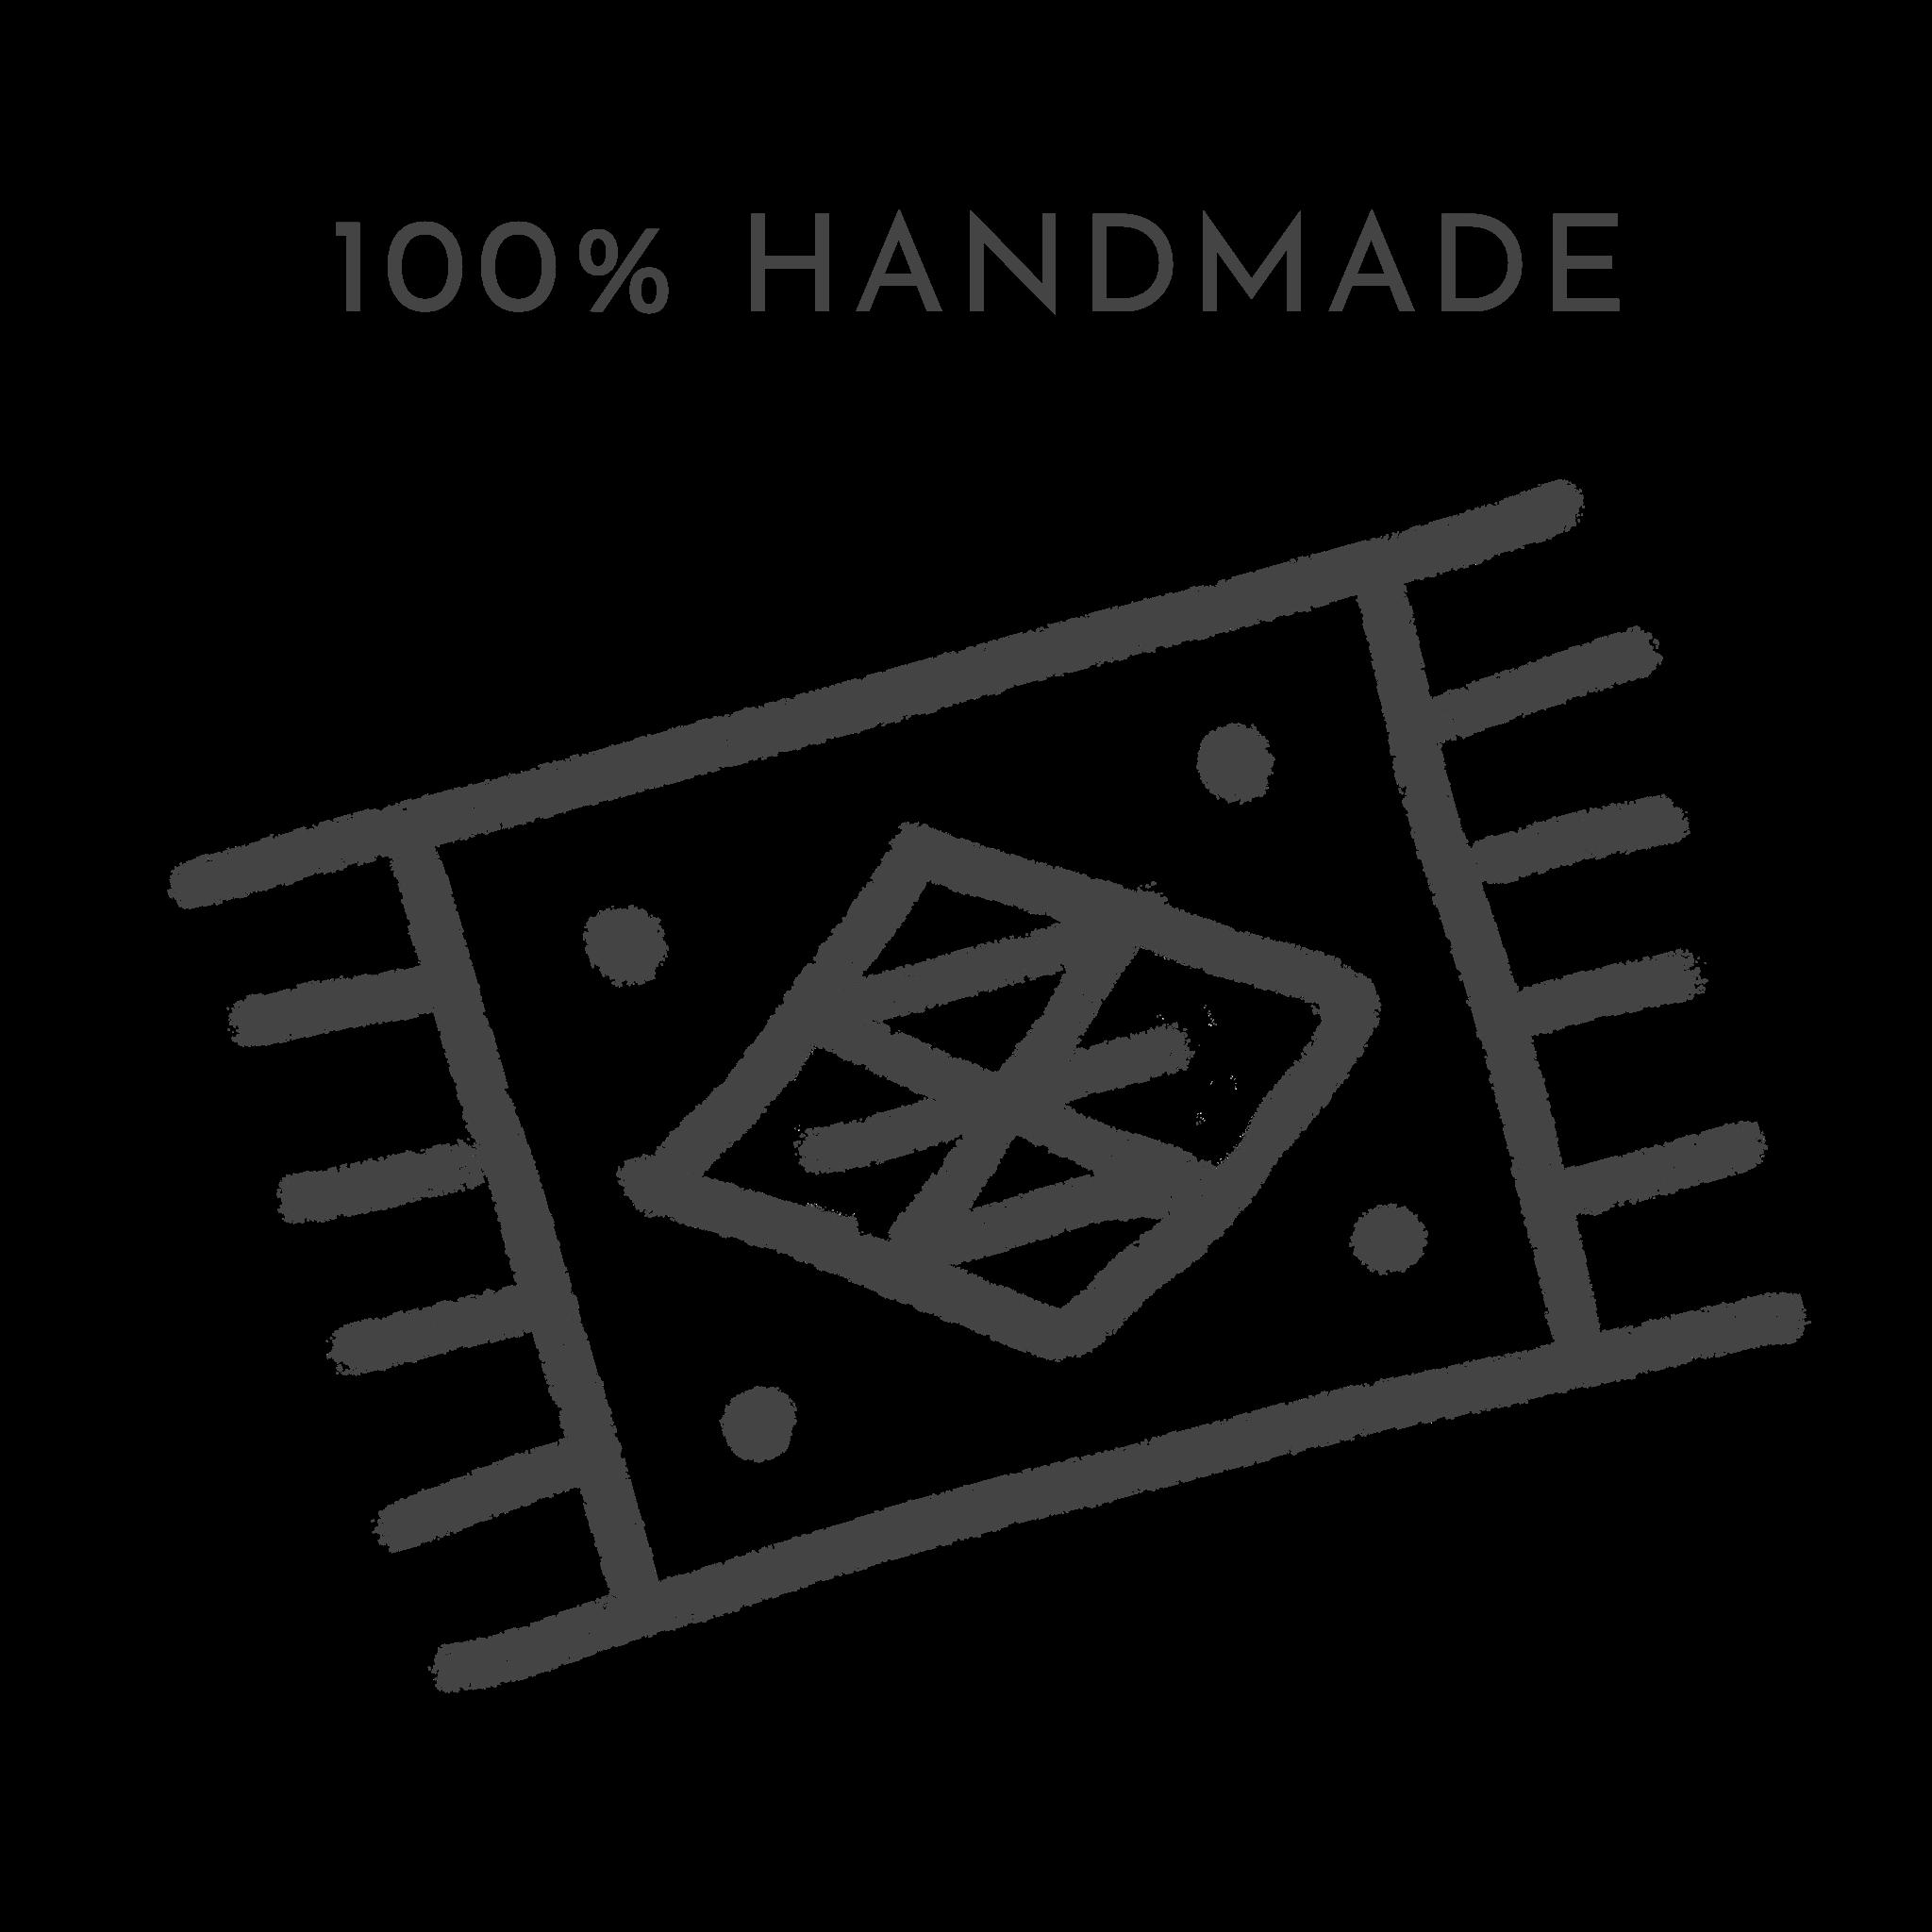 handmade-icon-link